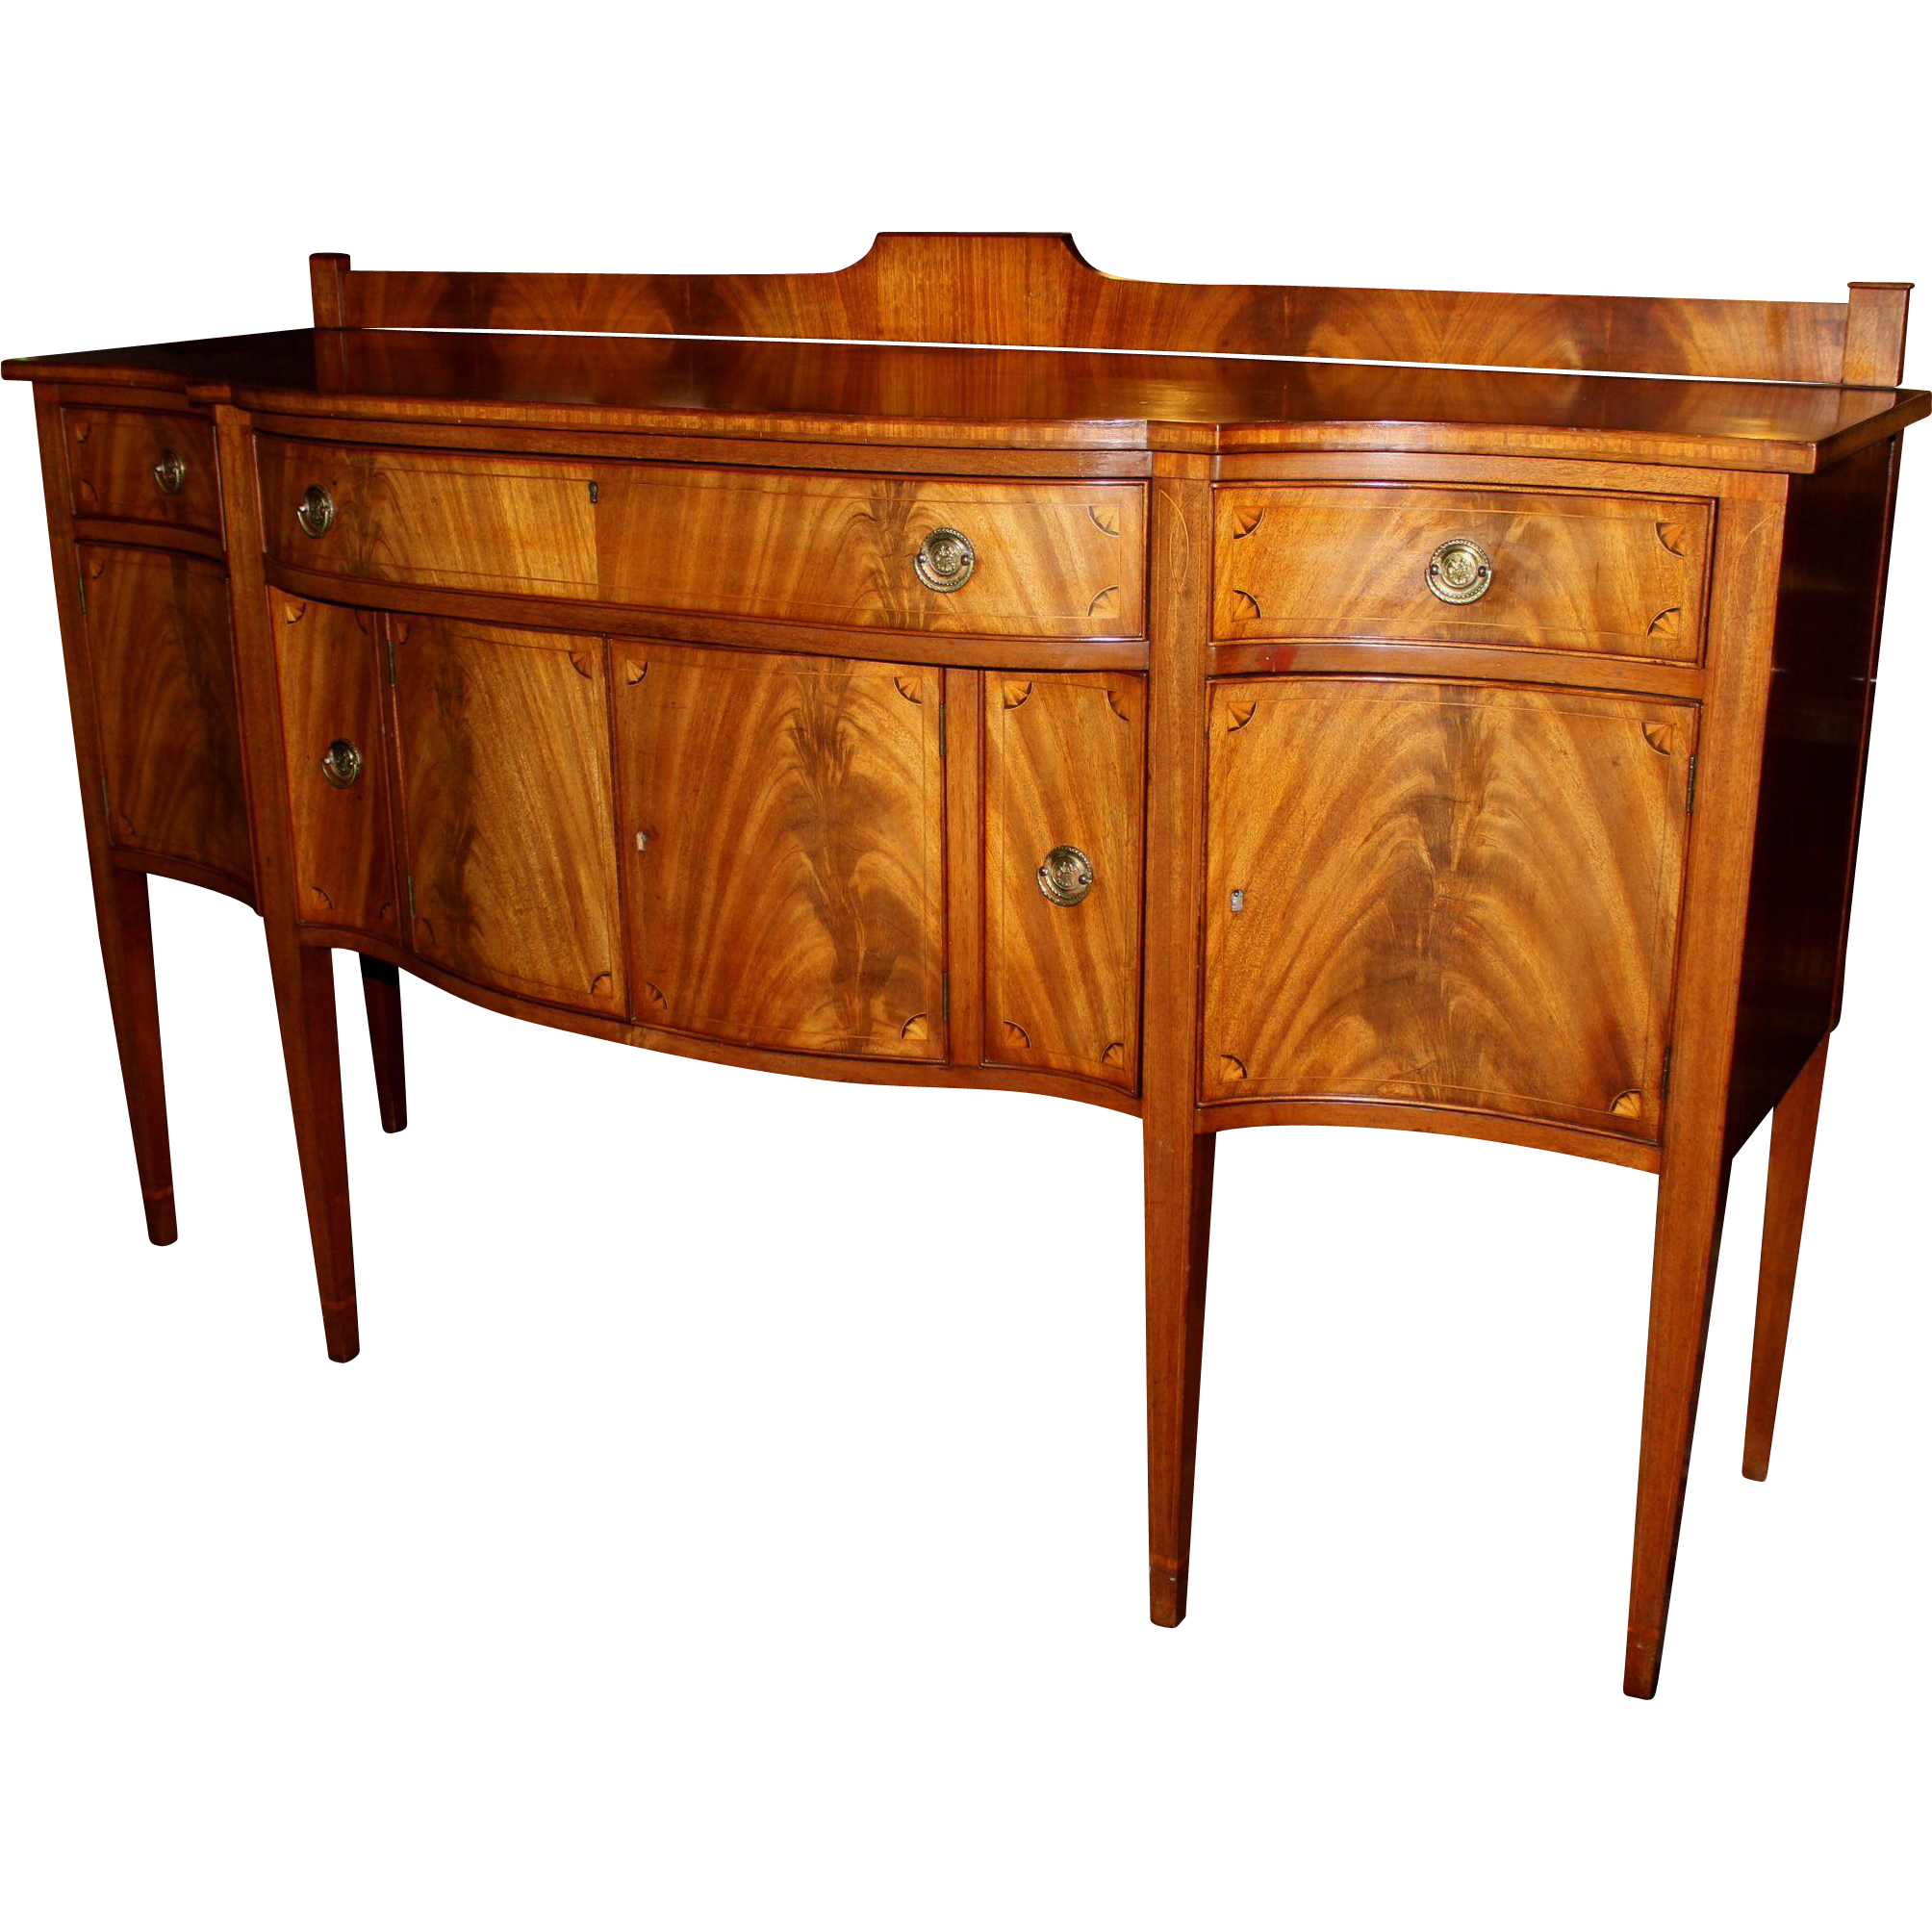 Hepplewhite Style Paine Furniture Sideboard with Crotched Mahogany Veneer